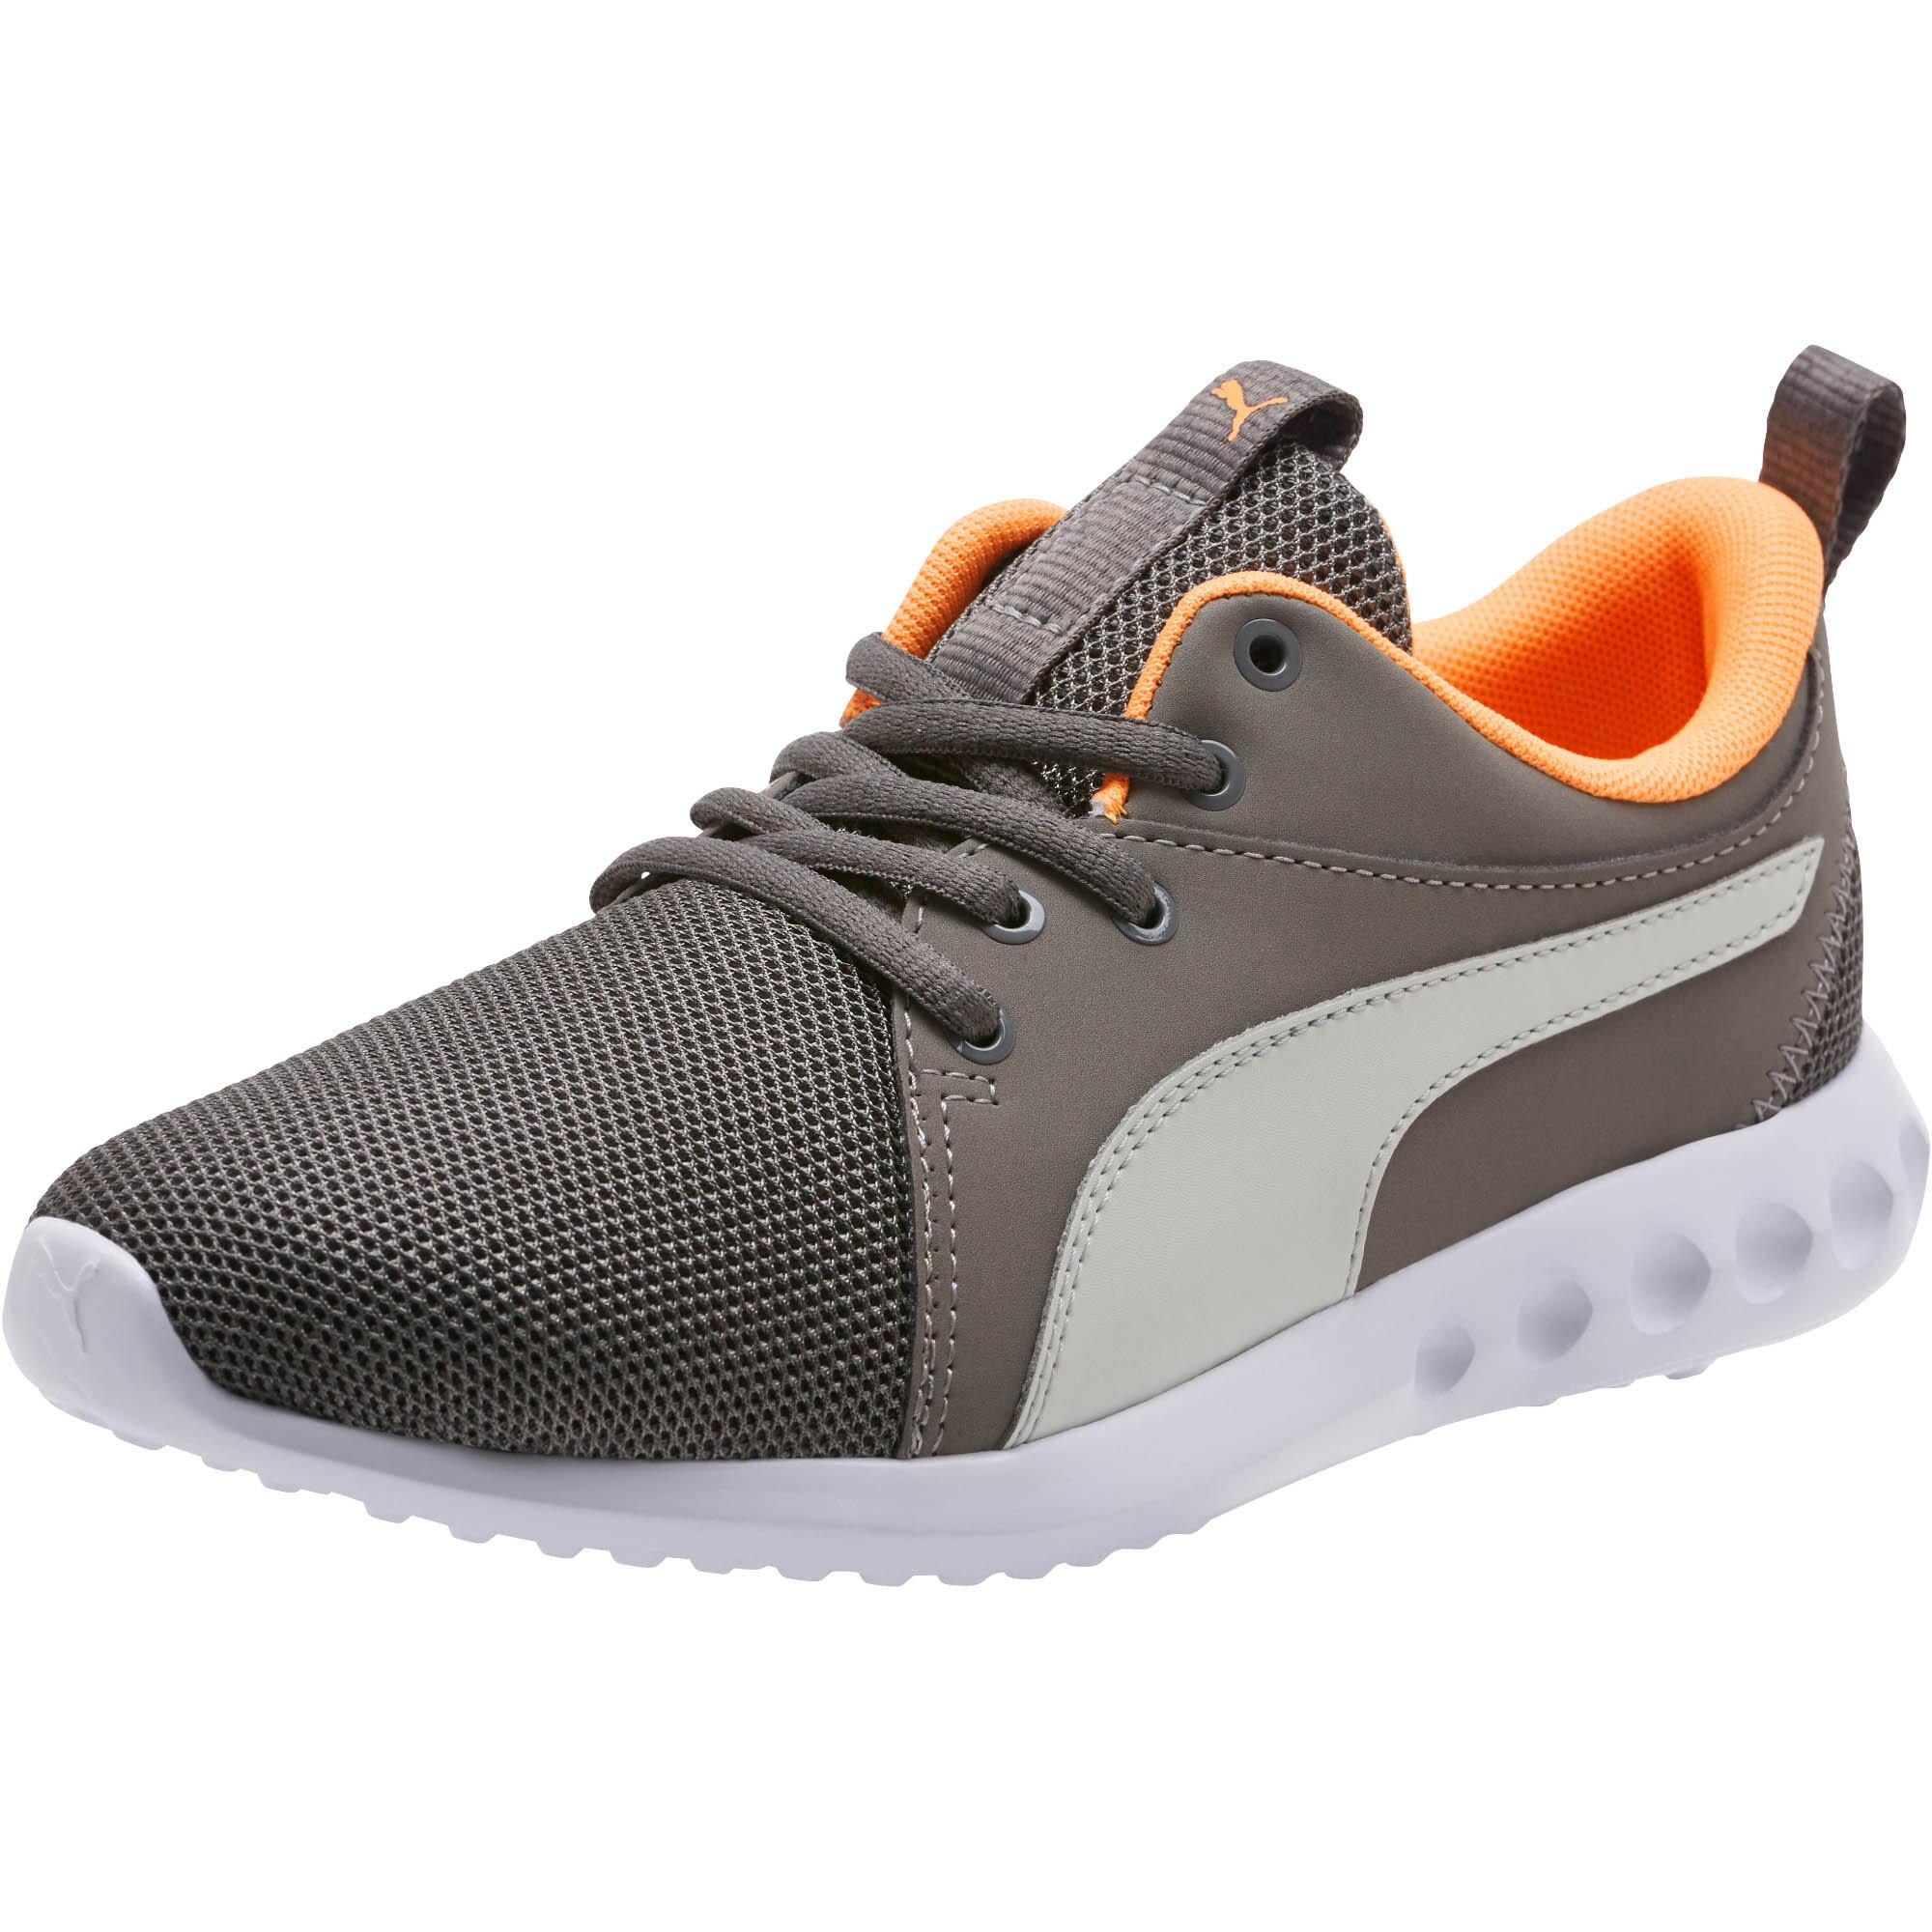 511c127147 PUMA Carson 2 Casual Sneakers JR Kids Shoe Kids | eBay